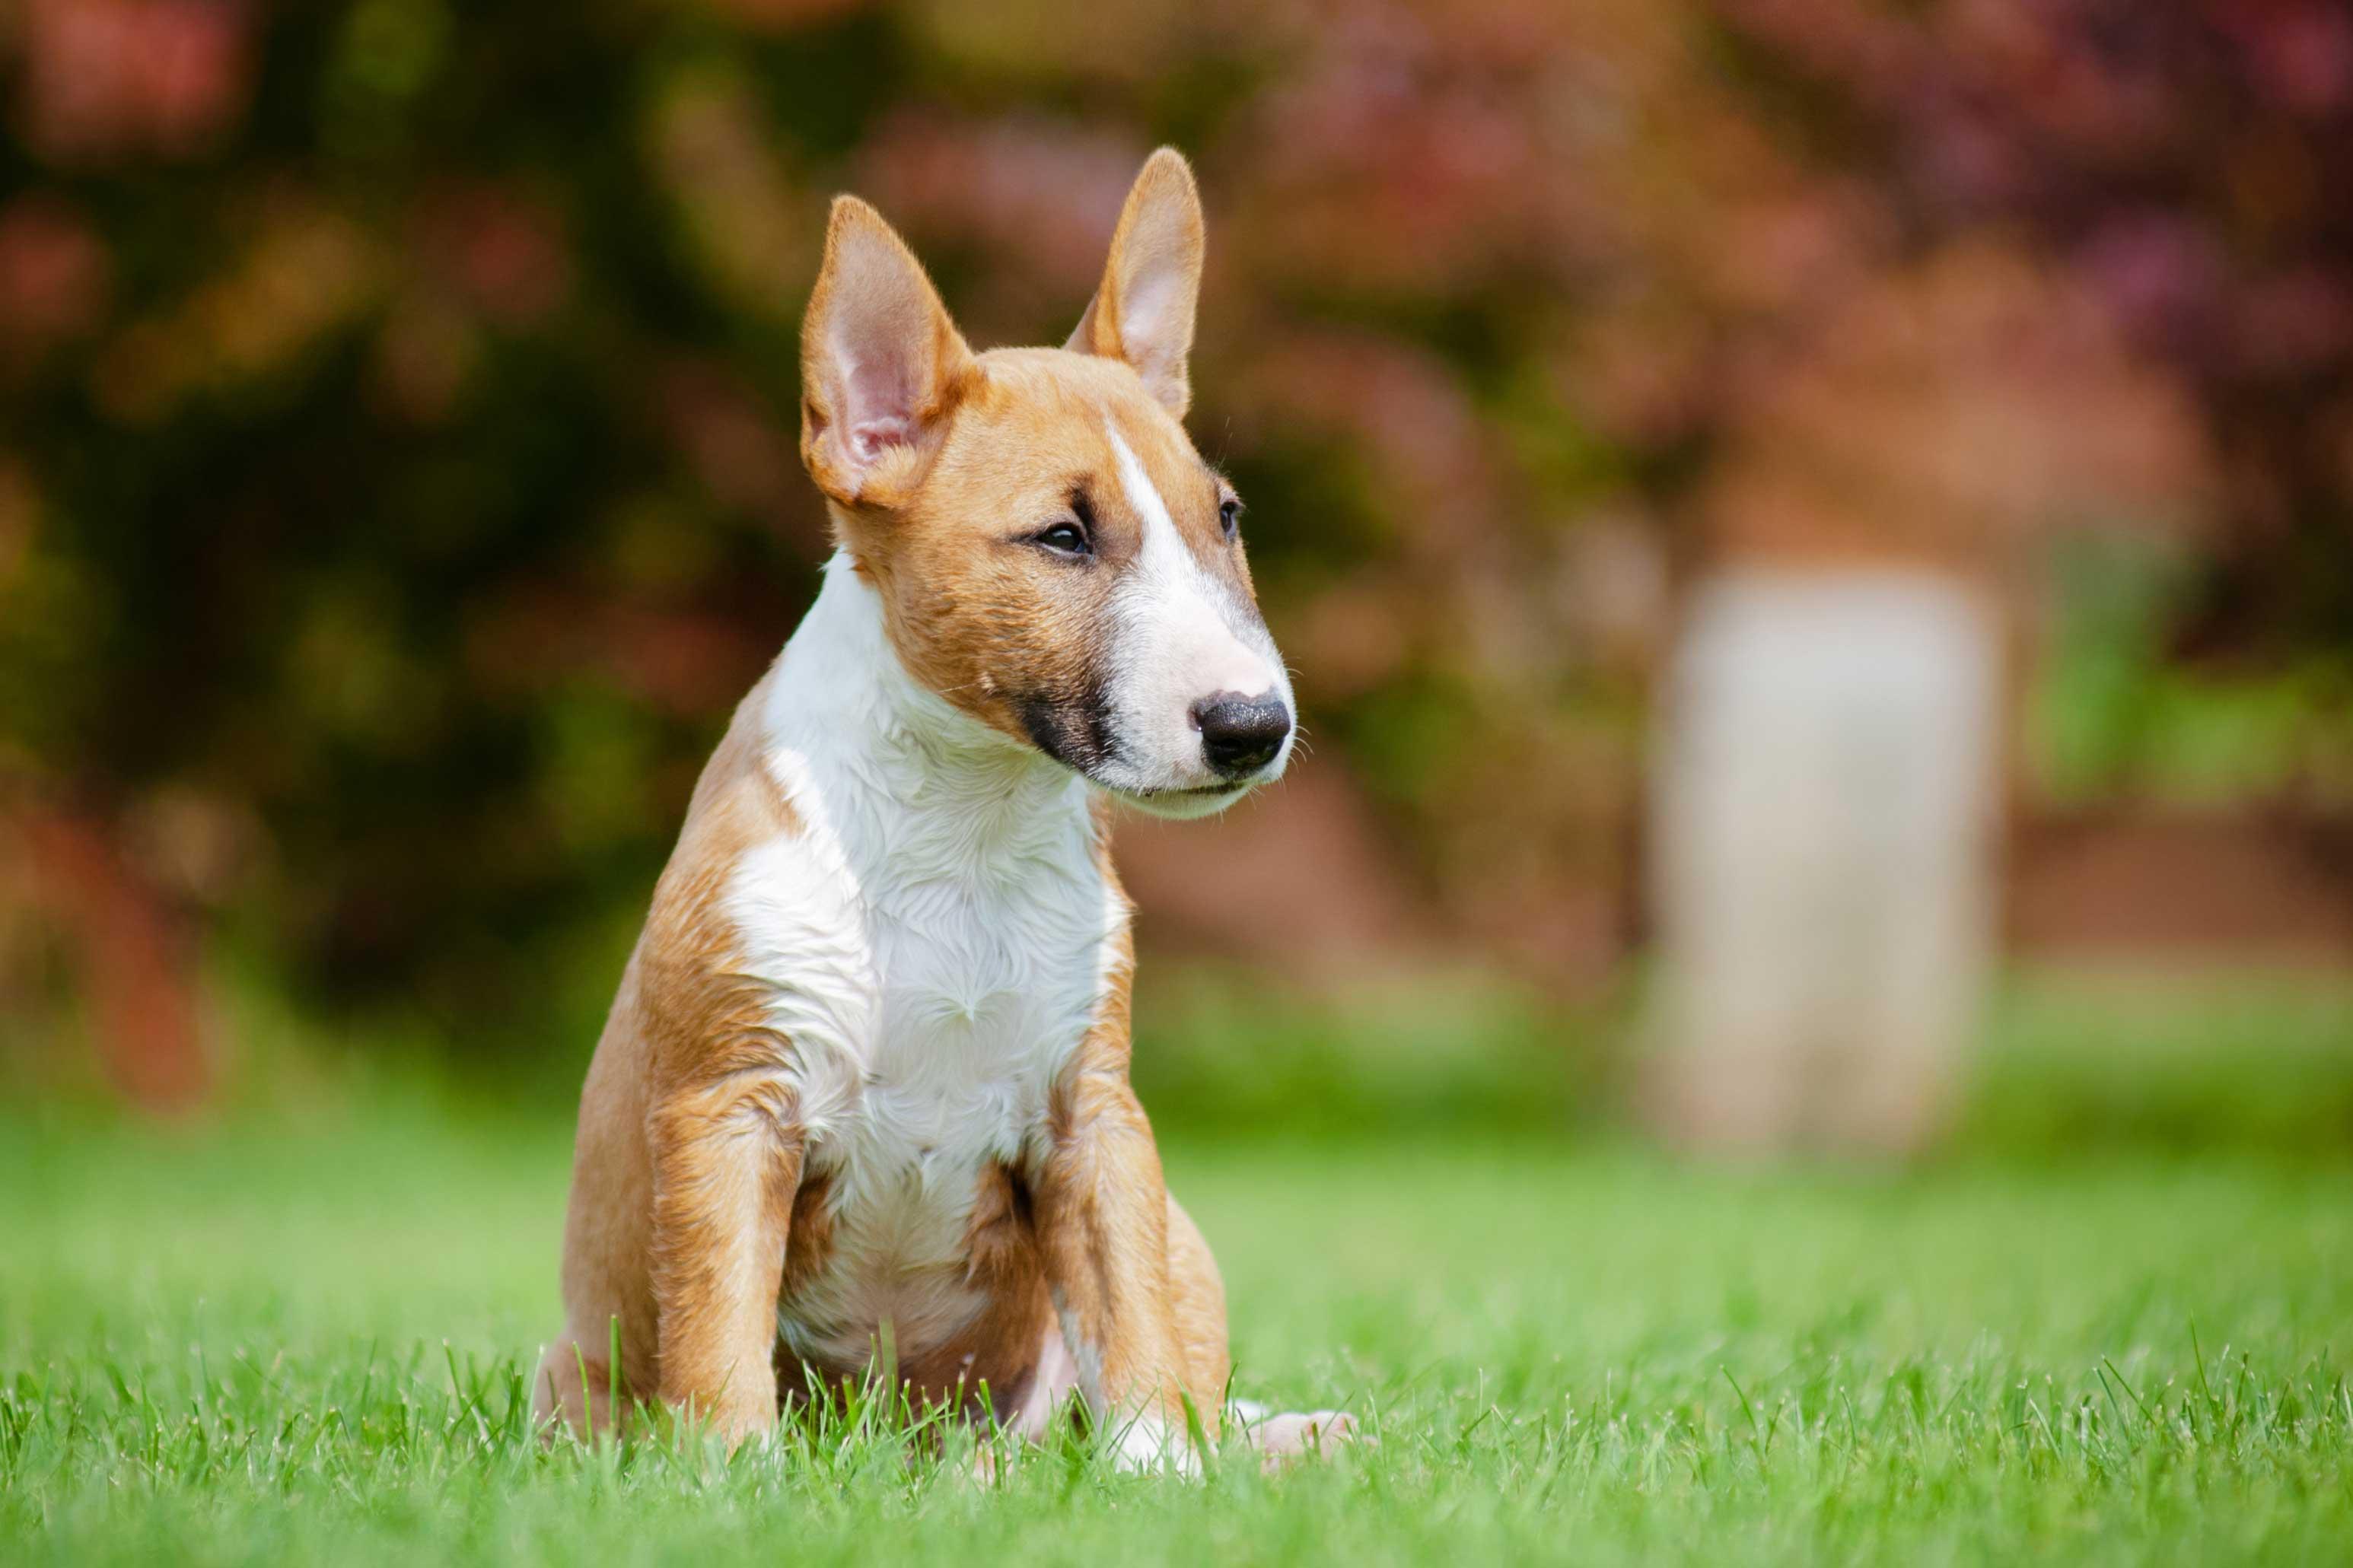 Miniature Bull Terrier Characteristics and Trainability | LoveToKnow